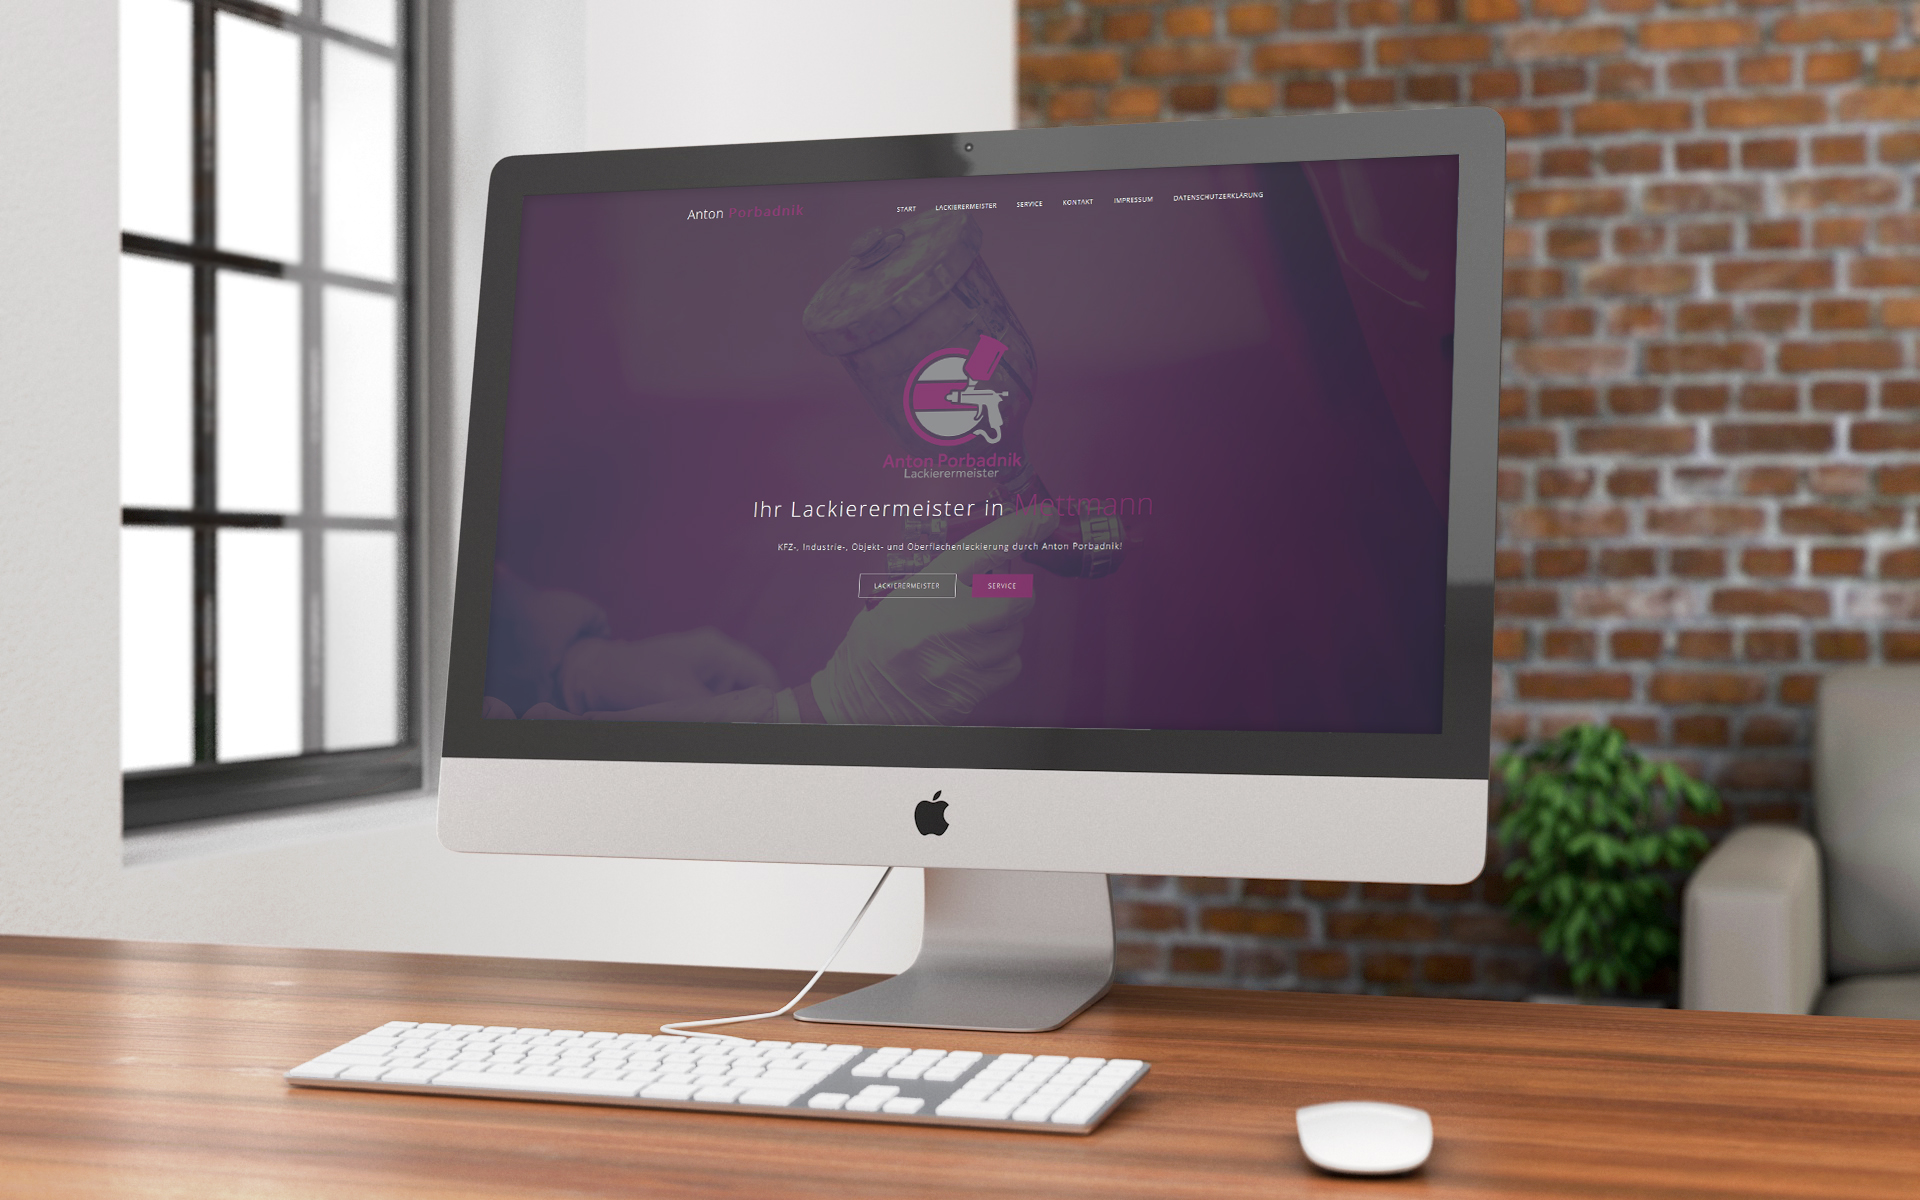 Webseite am PC Lackierermeister Anton Porbadnik